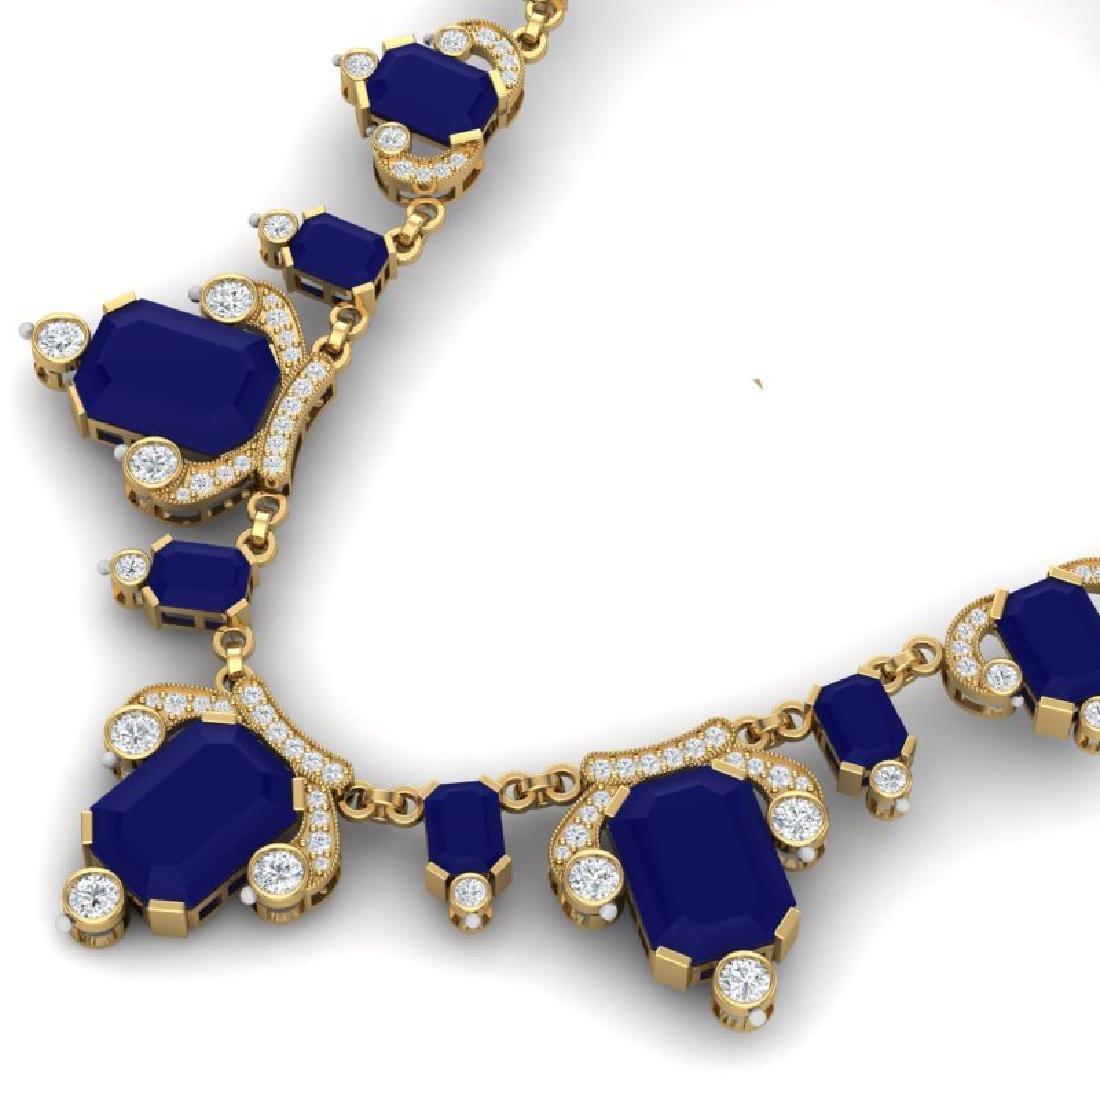 75.21 CTW Royalty Sapphire & VS Diamond Necklace 18K - 2